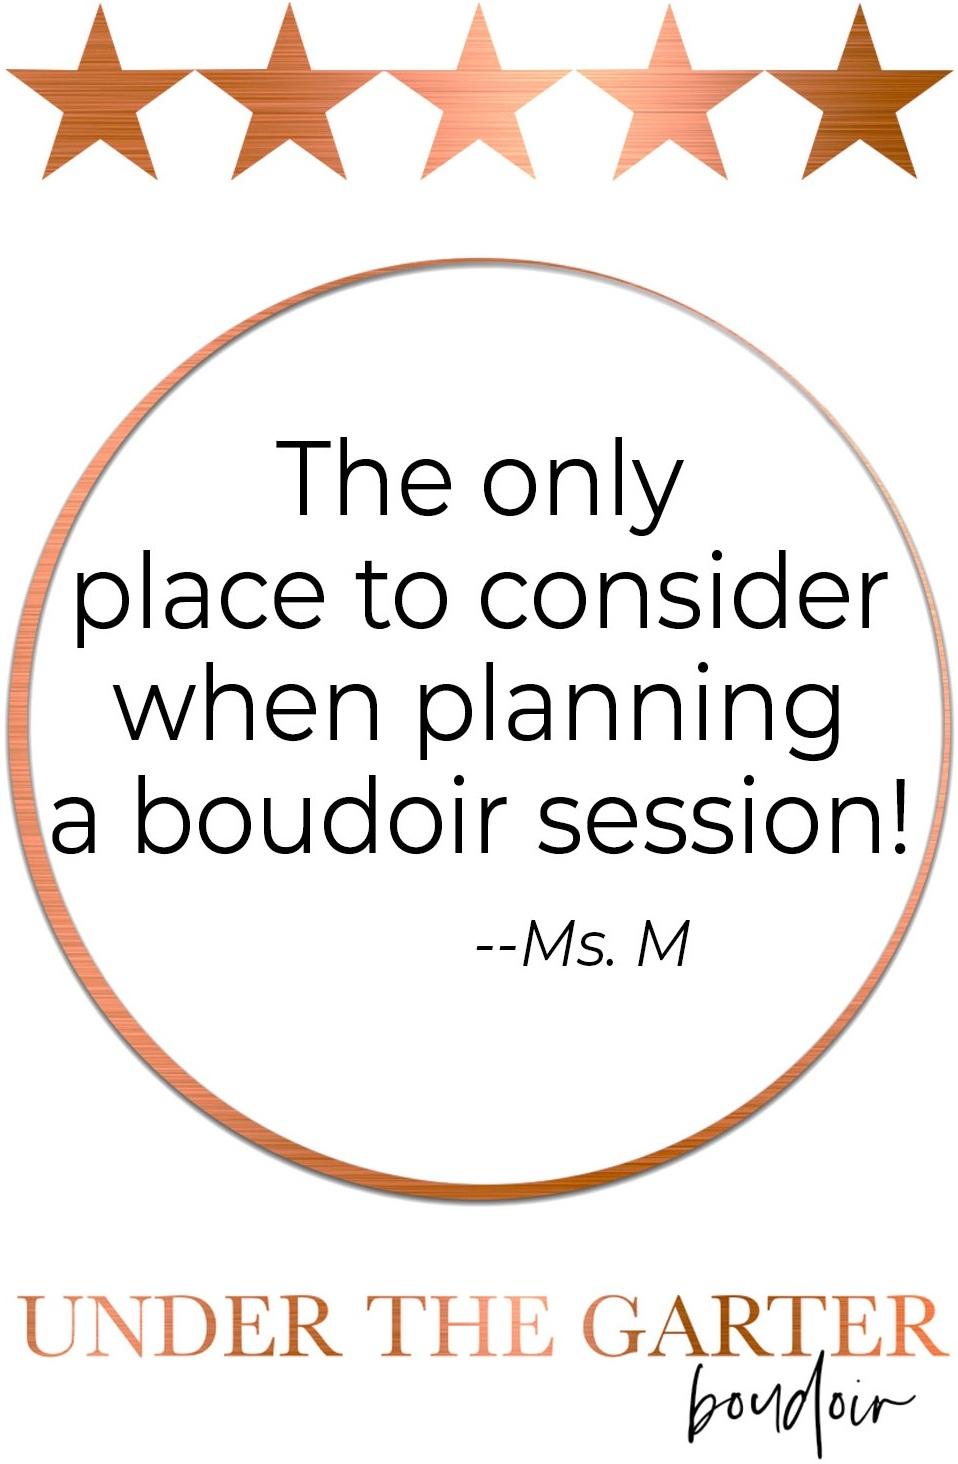 Boudoir-Photo-Reviews-Boudoir-Planning.jpg